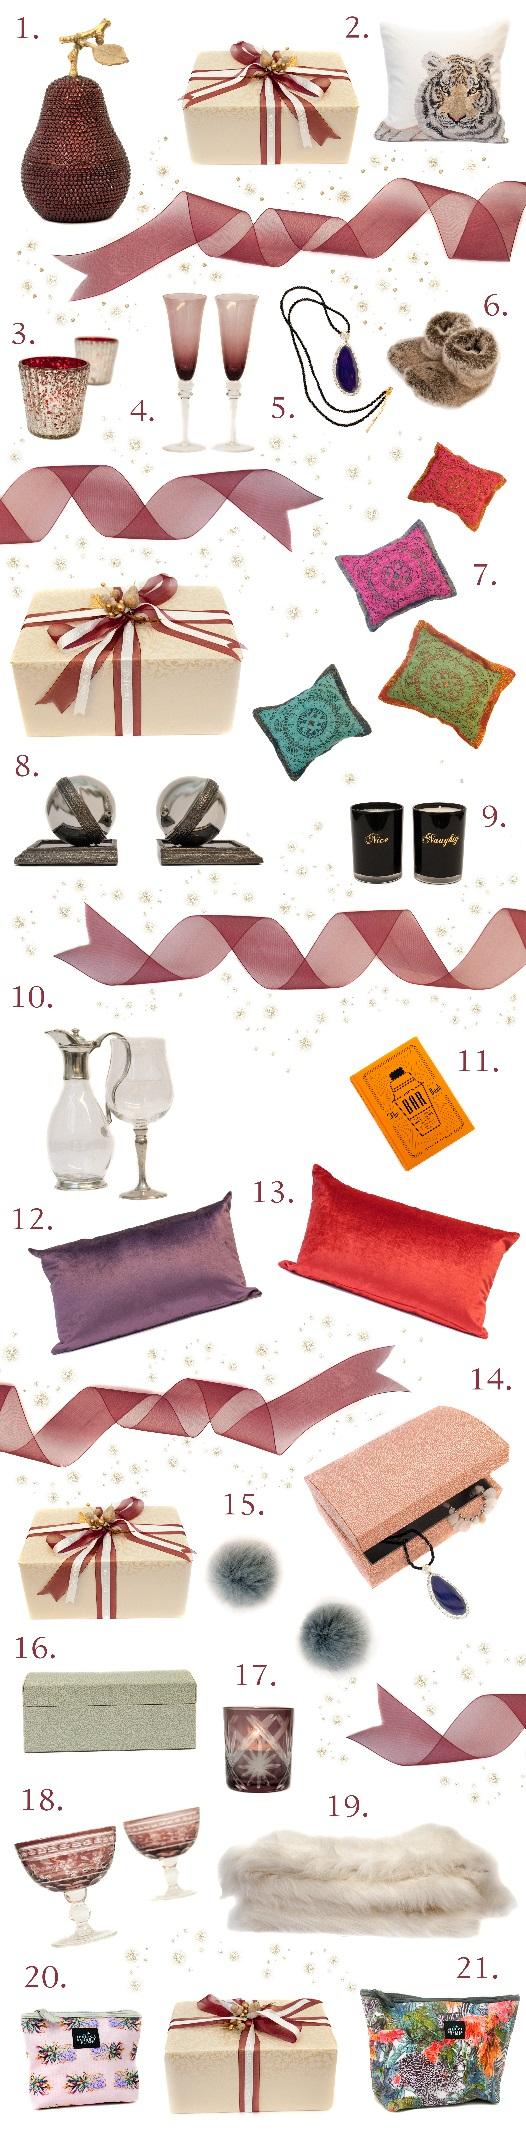 Jenny Blanc Blog - Ultimate Christmas Gift Guide